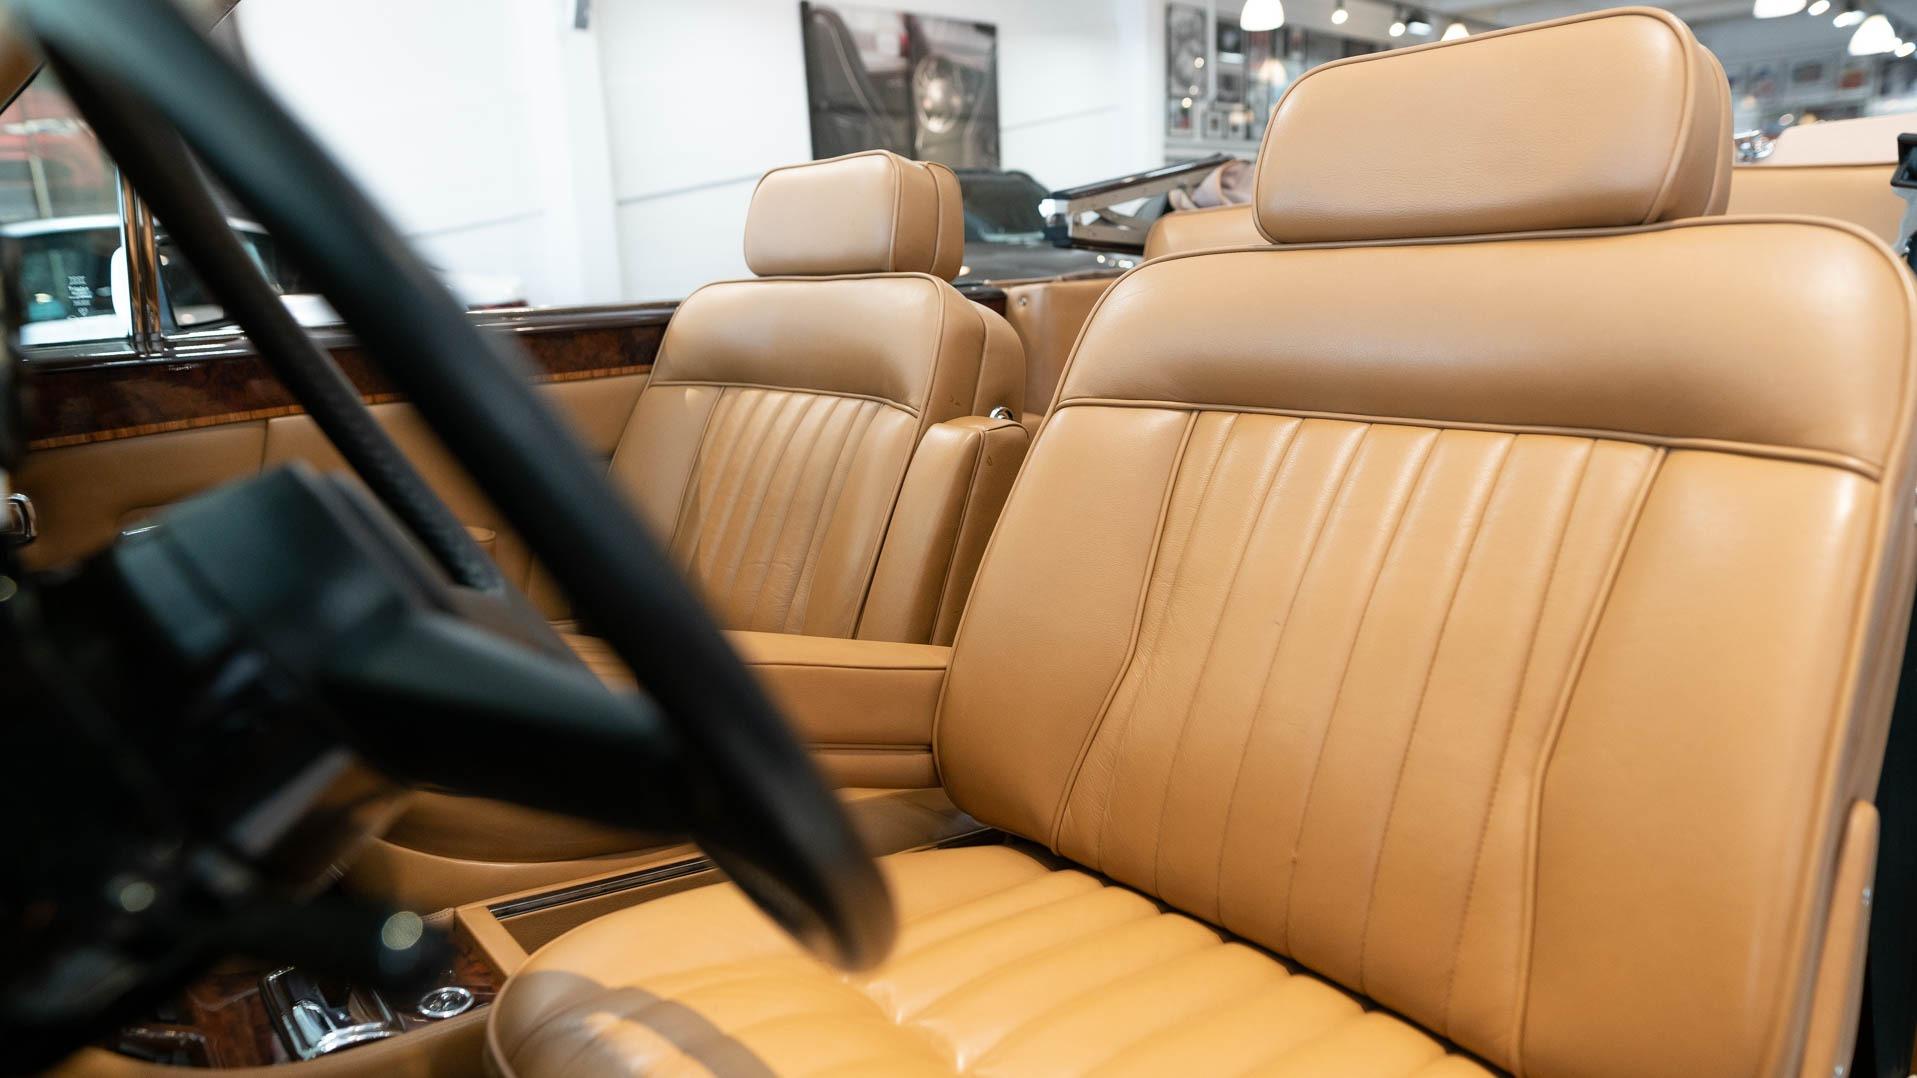 Used 1987 Rolls Royce Corniche II Convertible